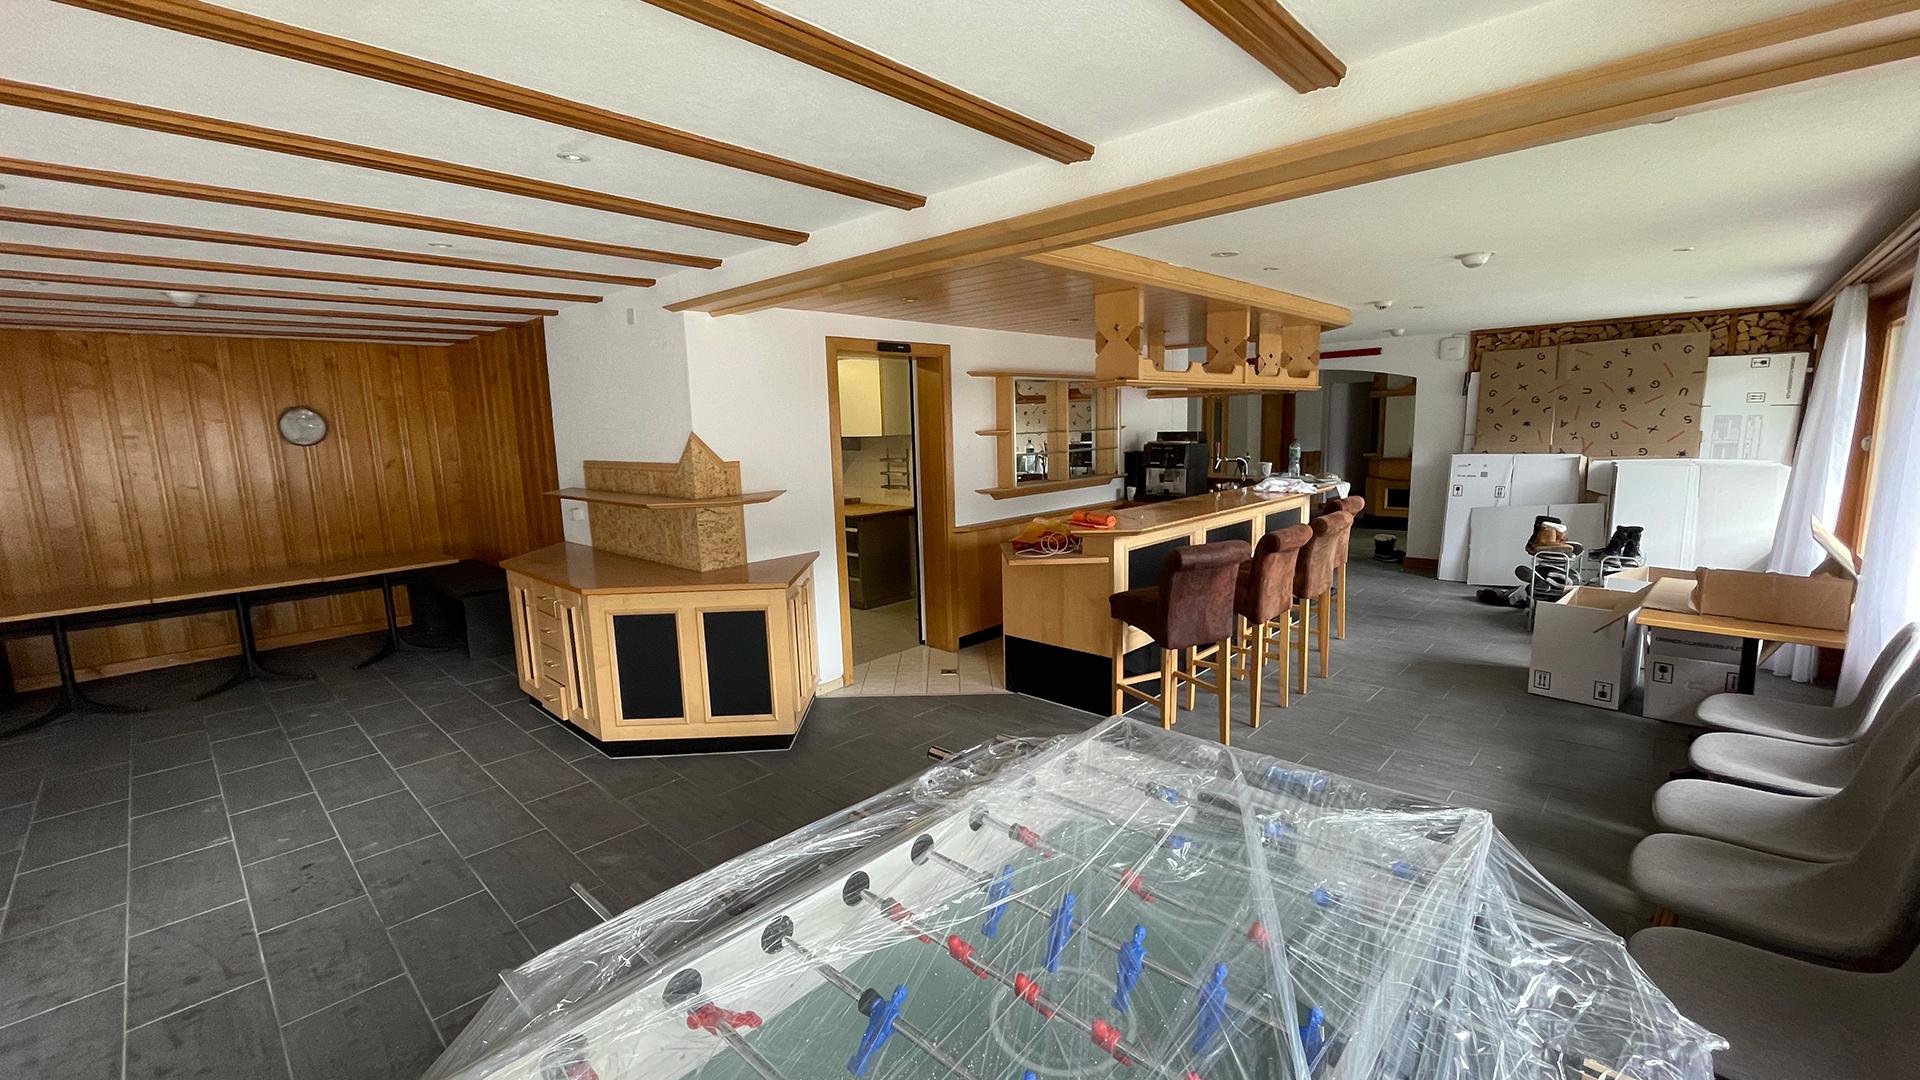 Carpe Diem Hotel Hotel, Switzerland